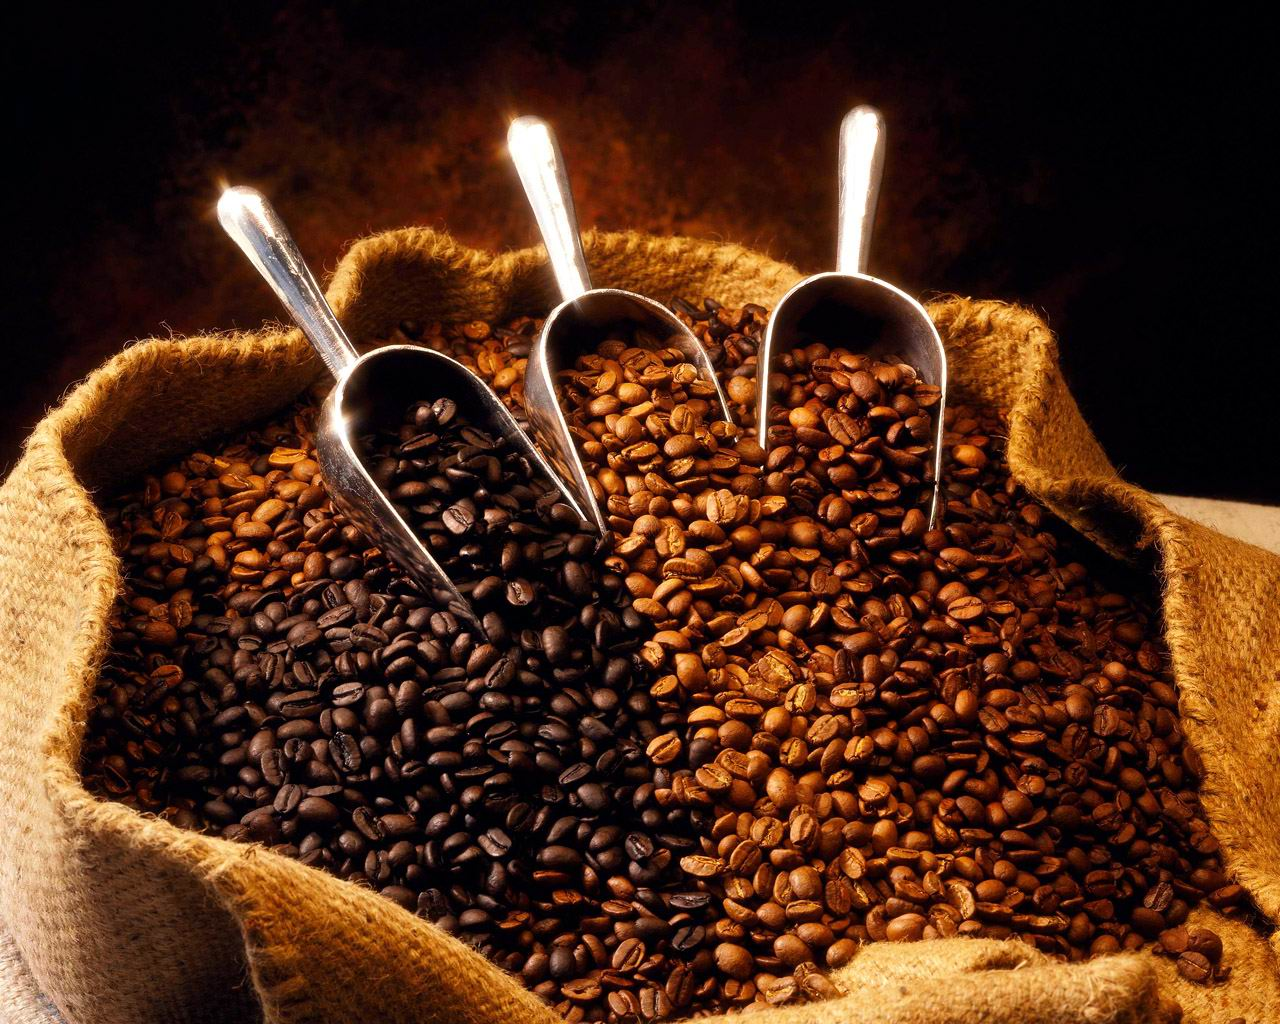 Narisara Traiyawong: ดื่มกาแฟ...มีประโยชน์และโทษอย่างไร??..